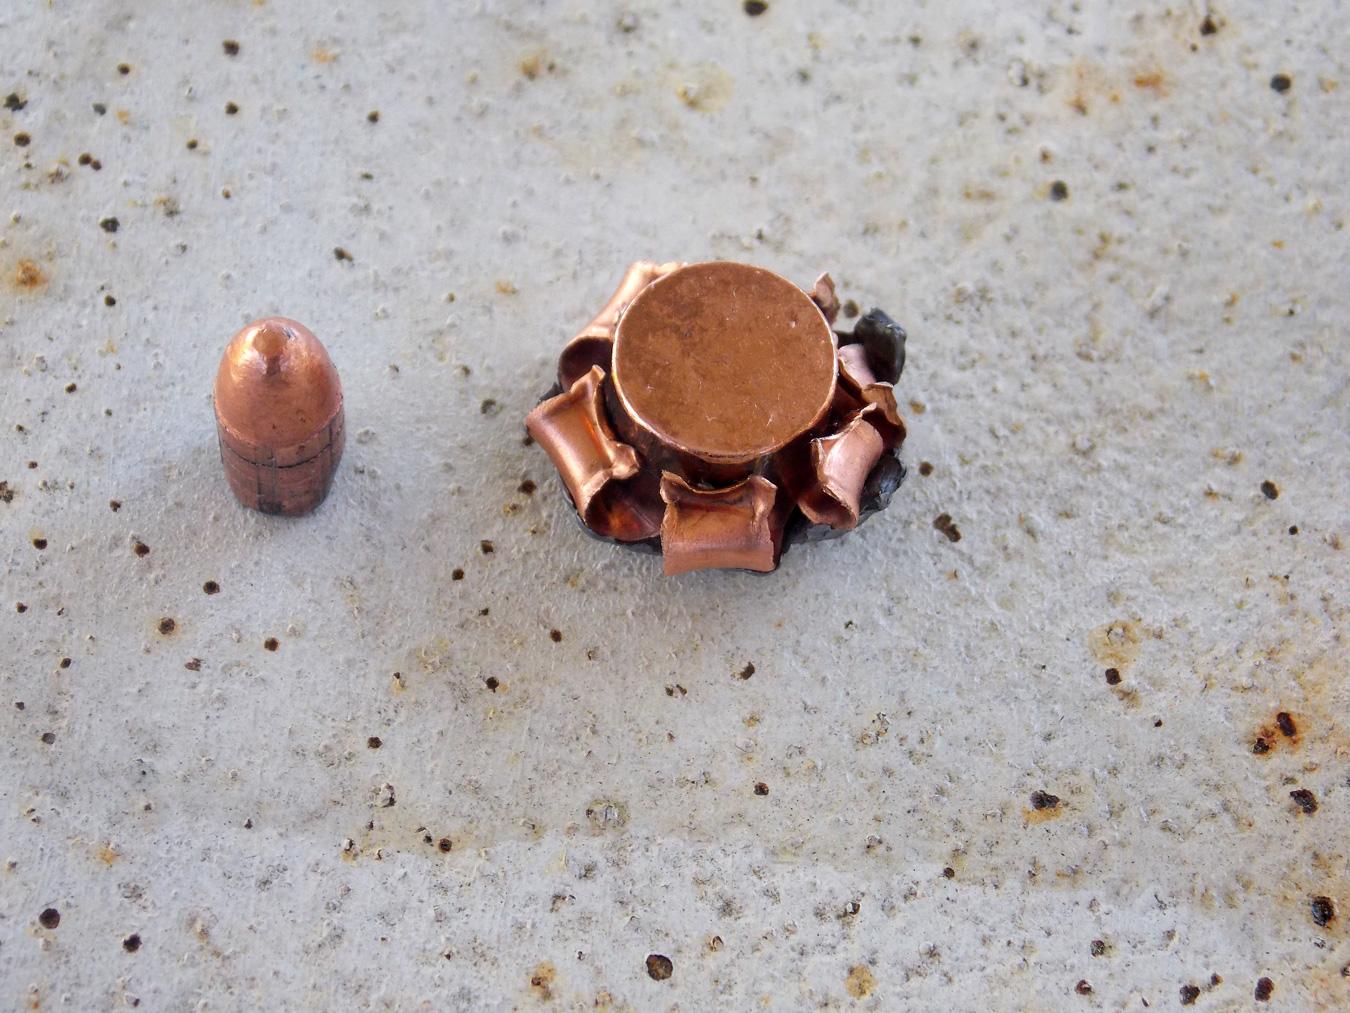 40-grain .22 LR bullet left,  upset .40 caliber JHP right